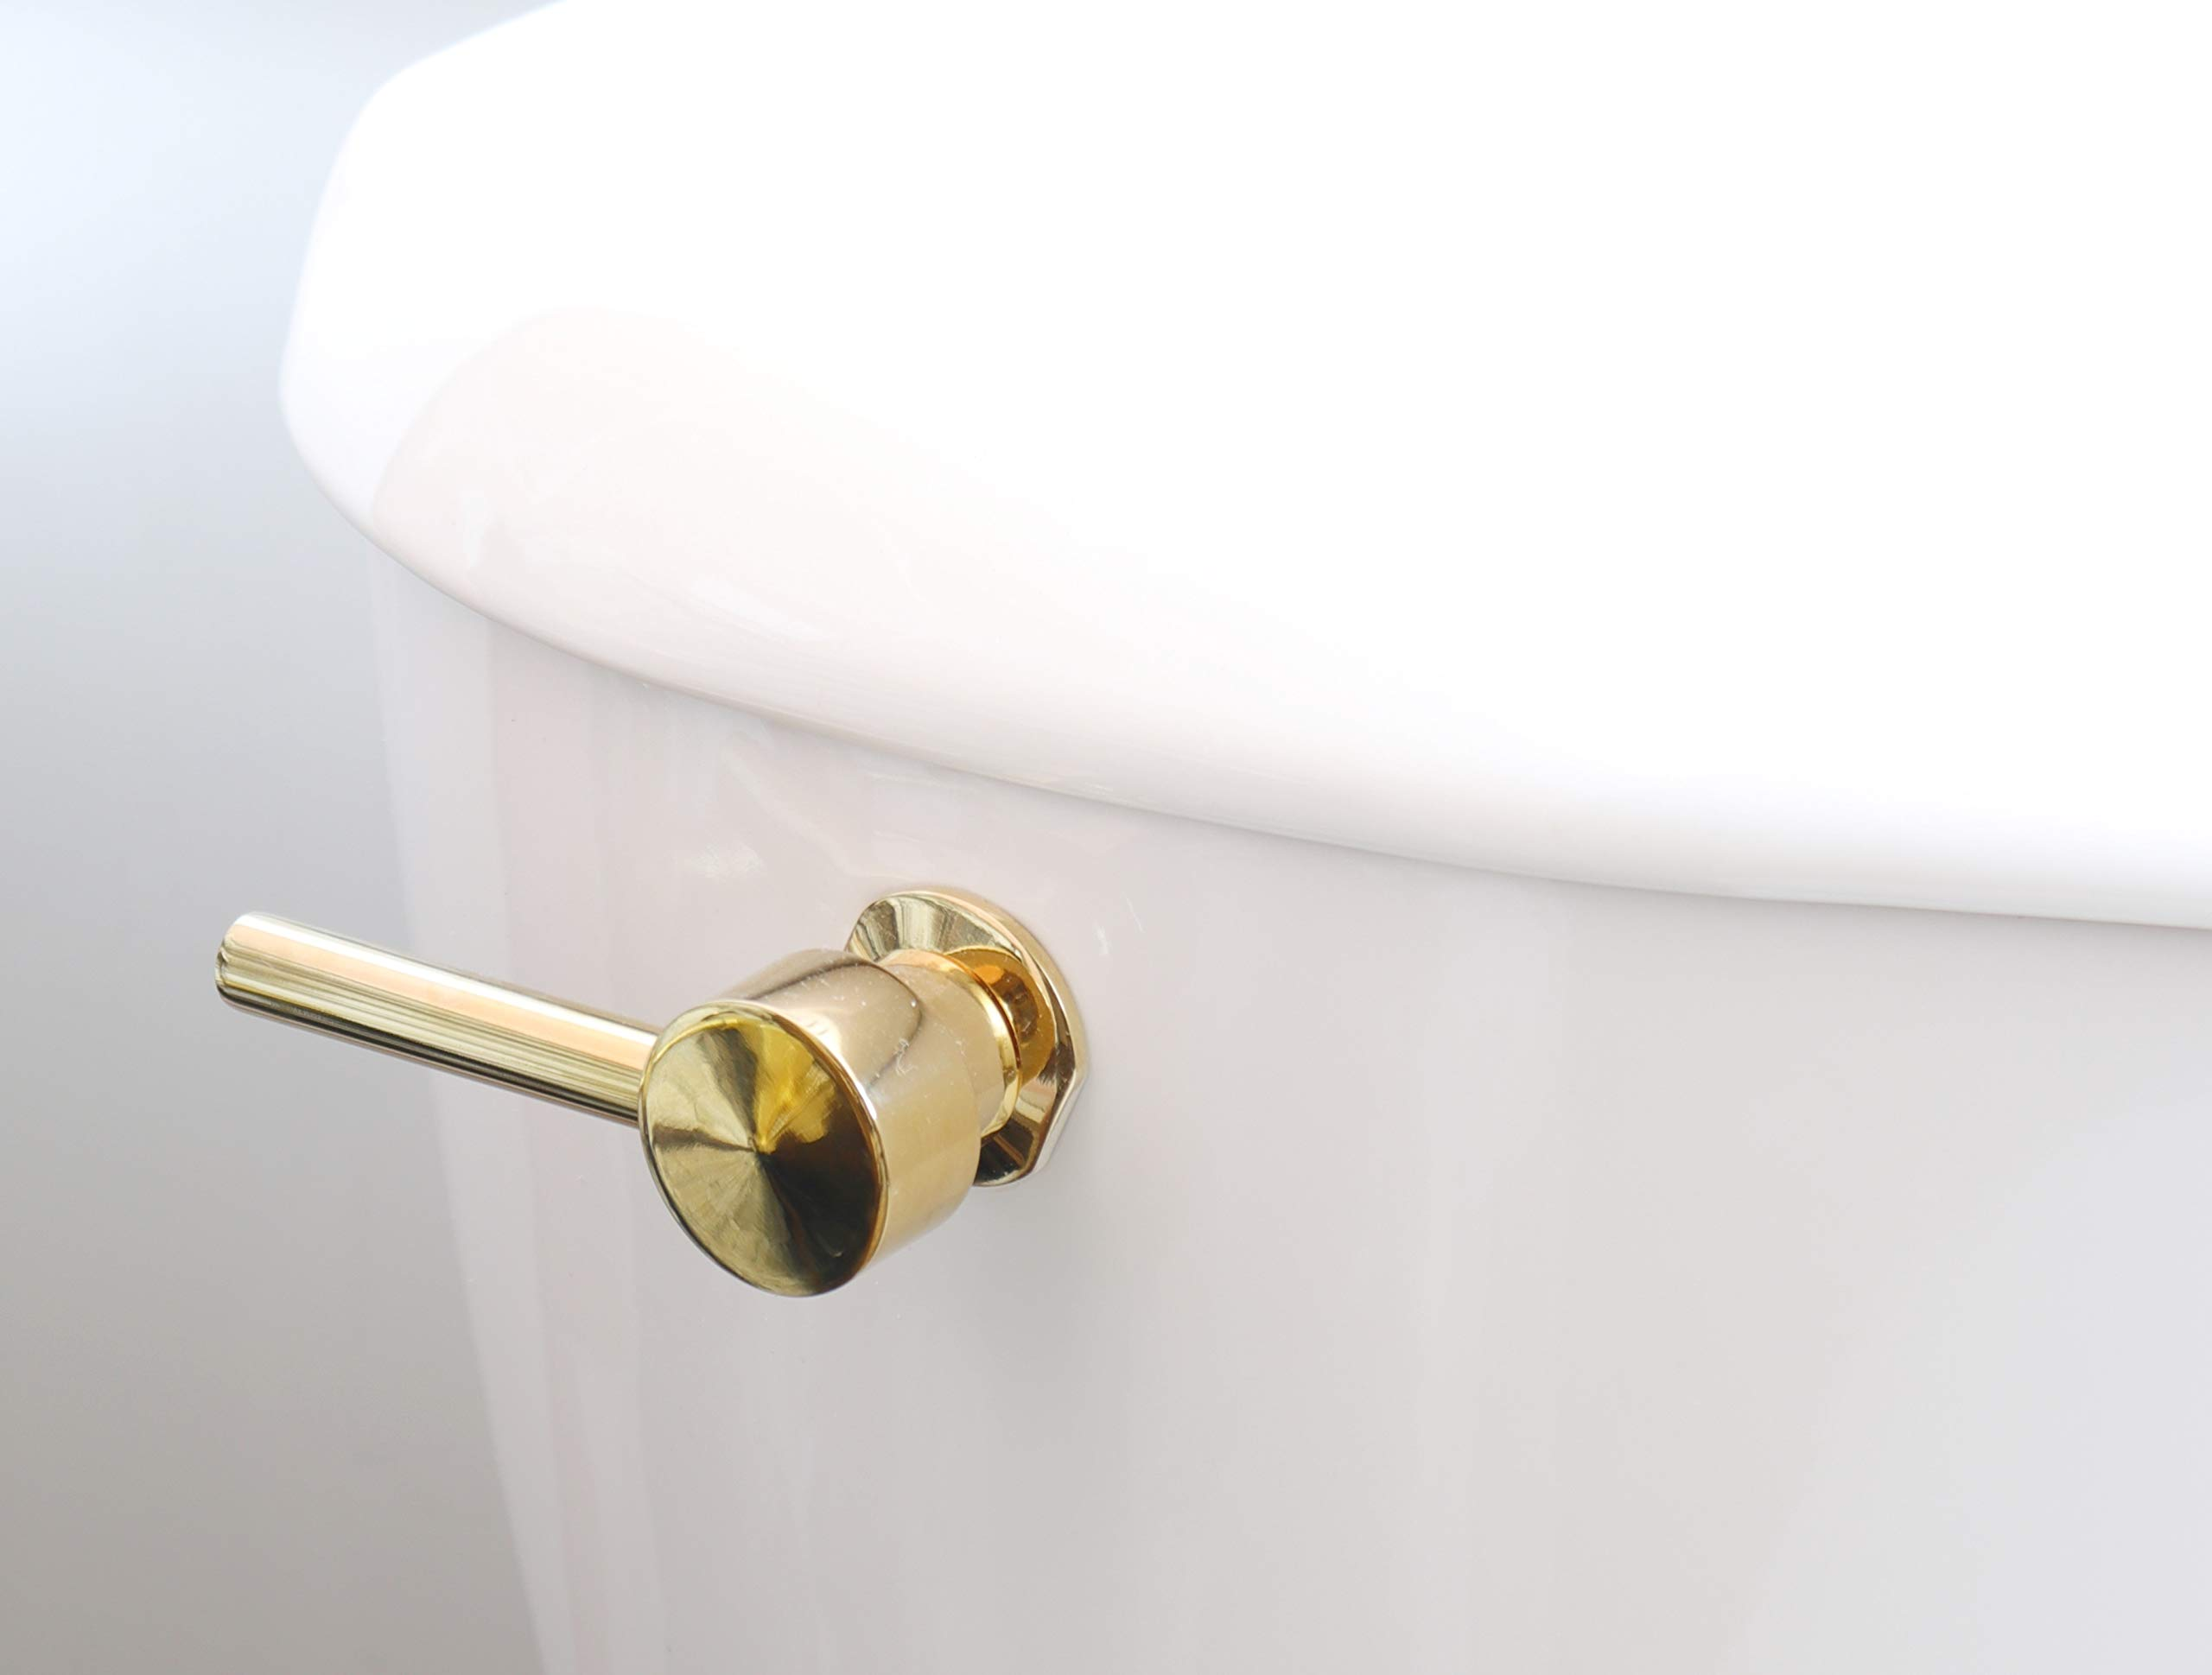 Kingston Brass KTDL2 Concord Tank Lever, Polished Brass, 2-13/16'' Handle Length by Kingston Brass (Image #3)